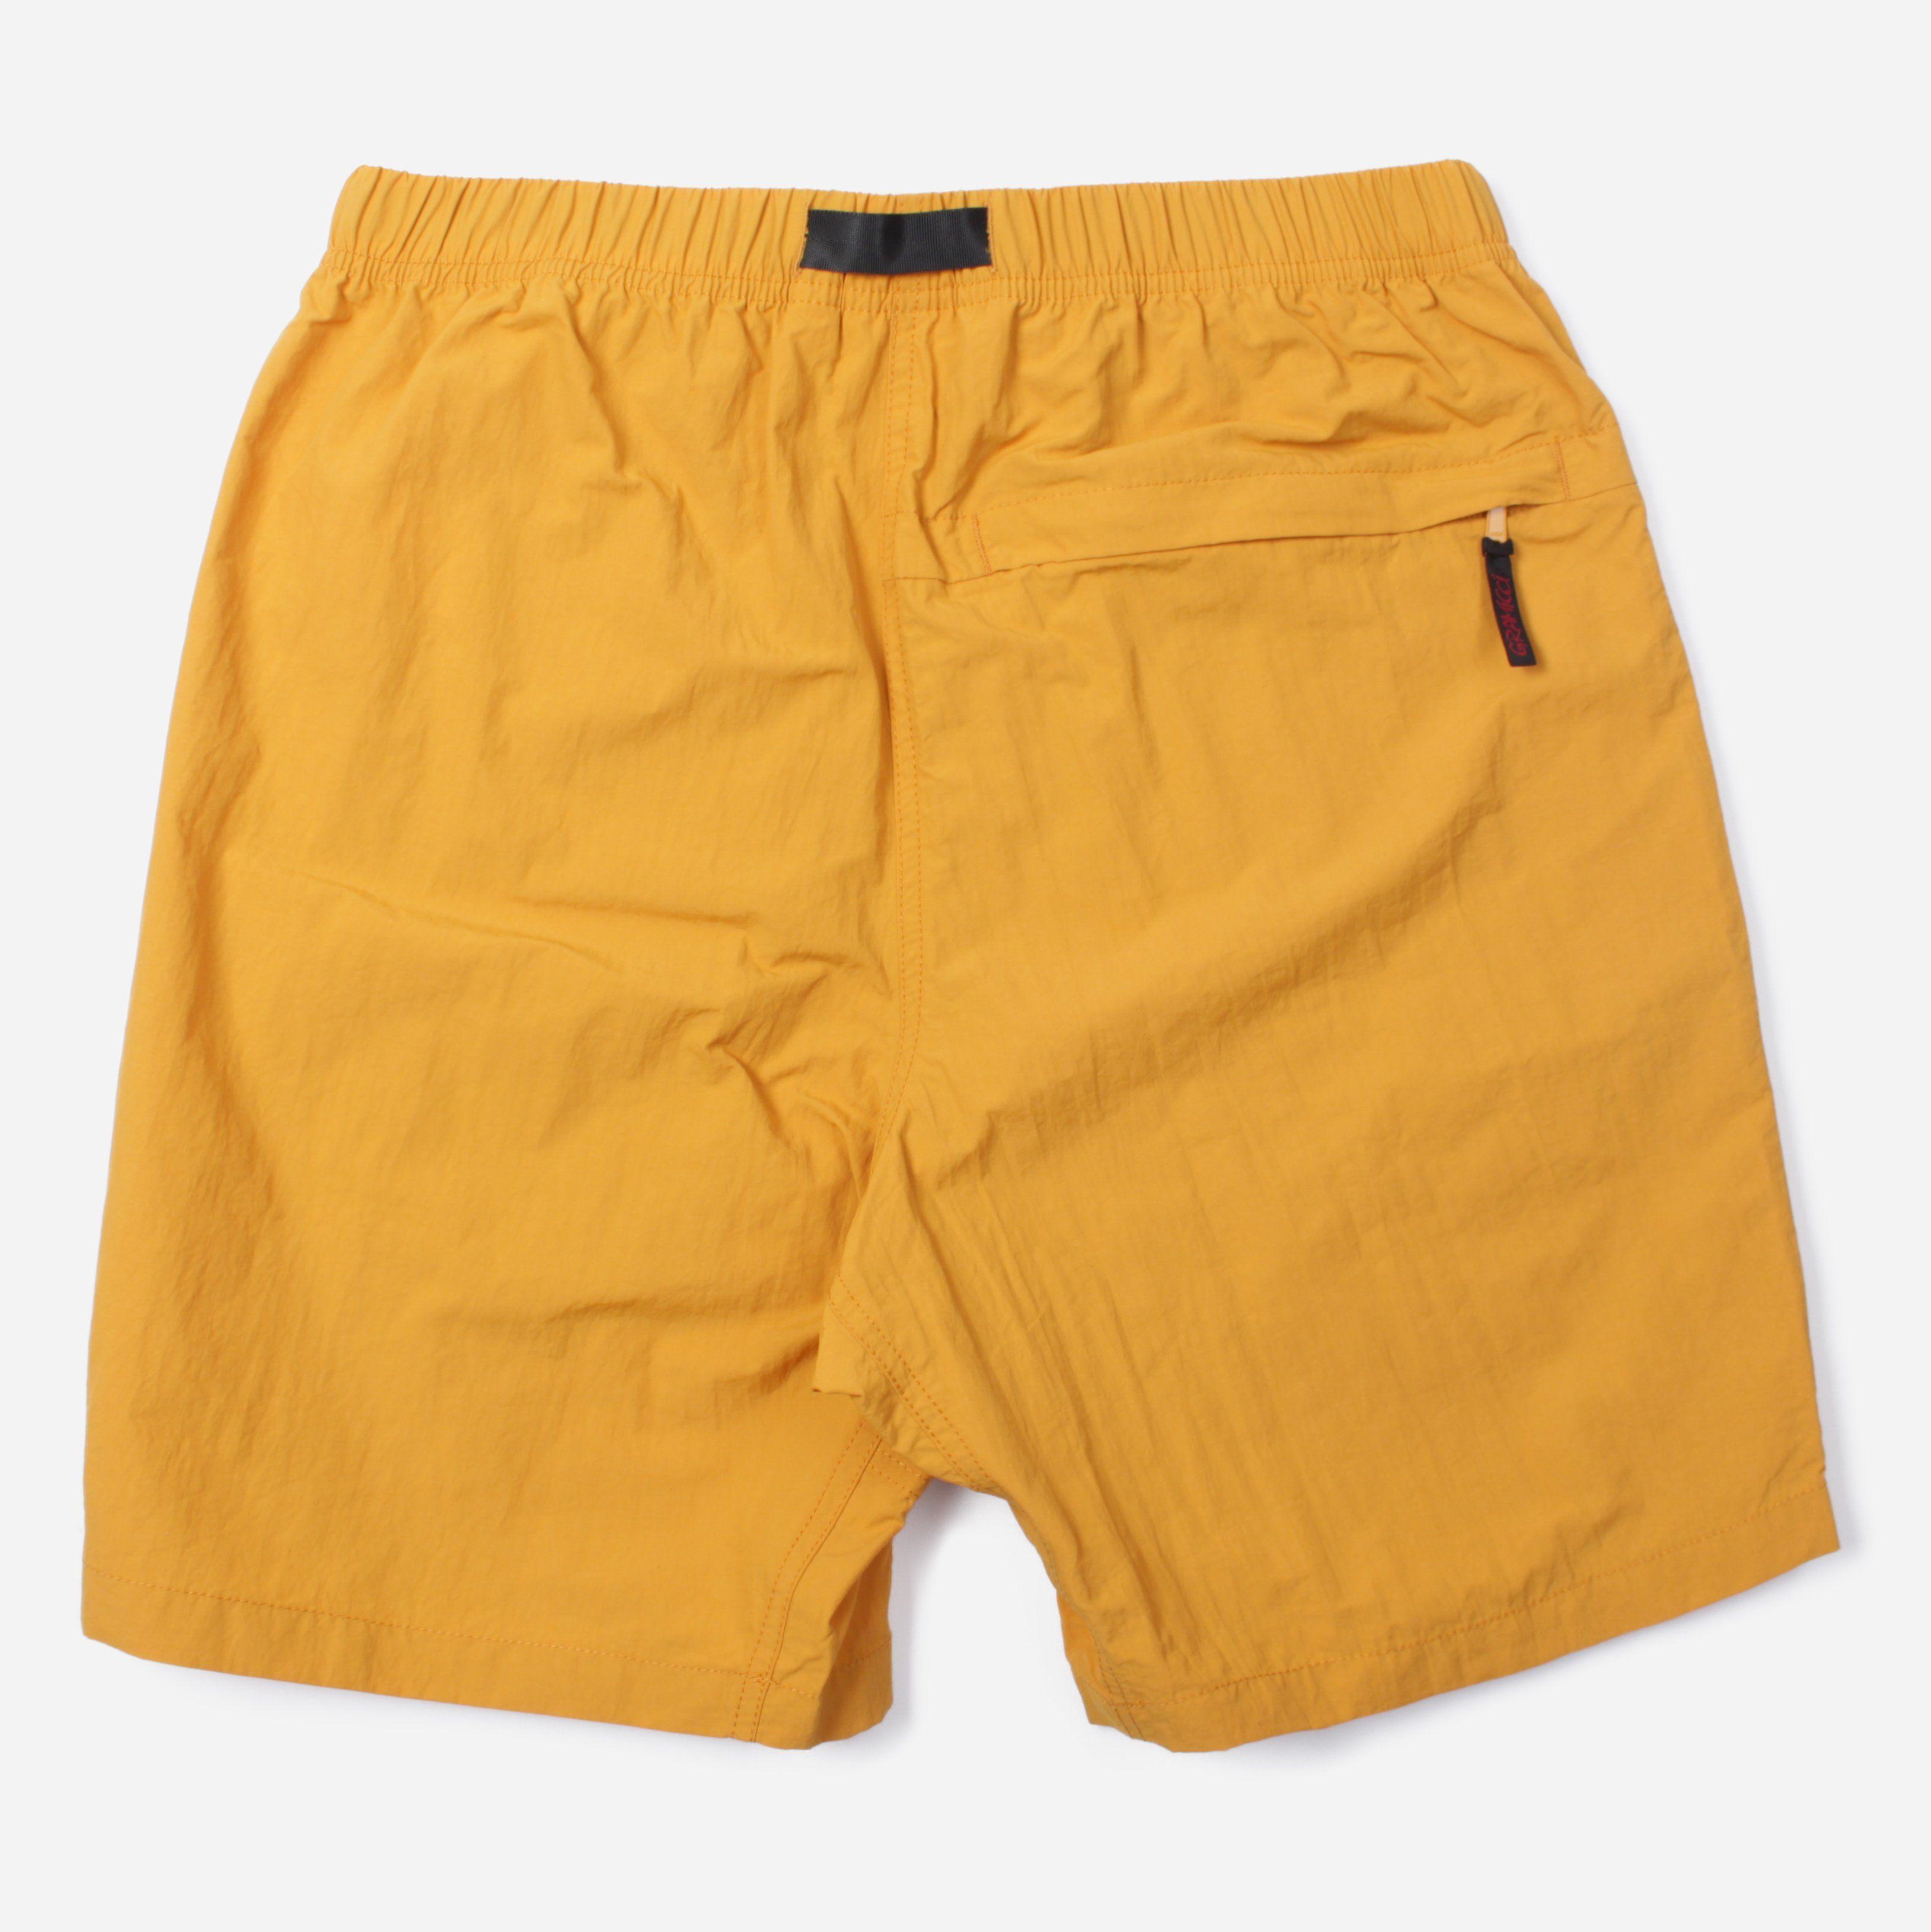 Gramicci Shell Packable Shorts